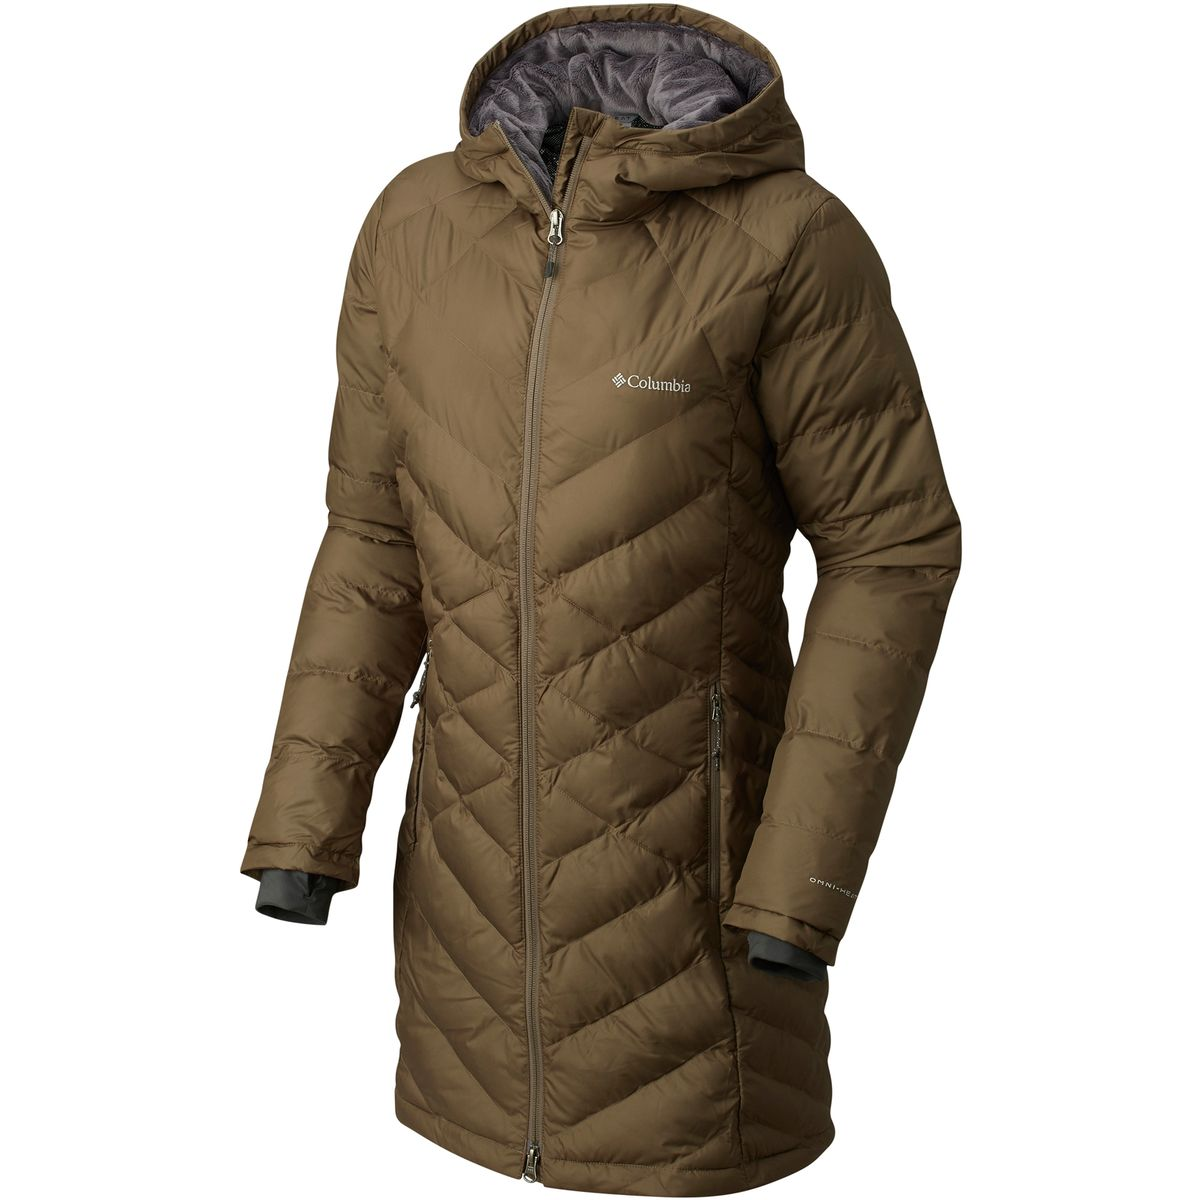 Columbia Heavenly Long Hooded Jacket - Women